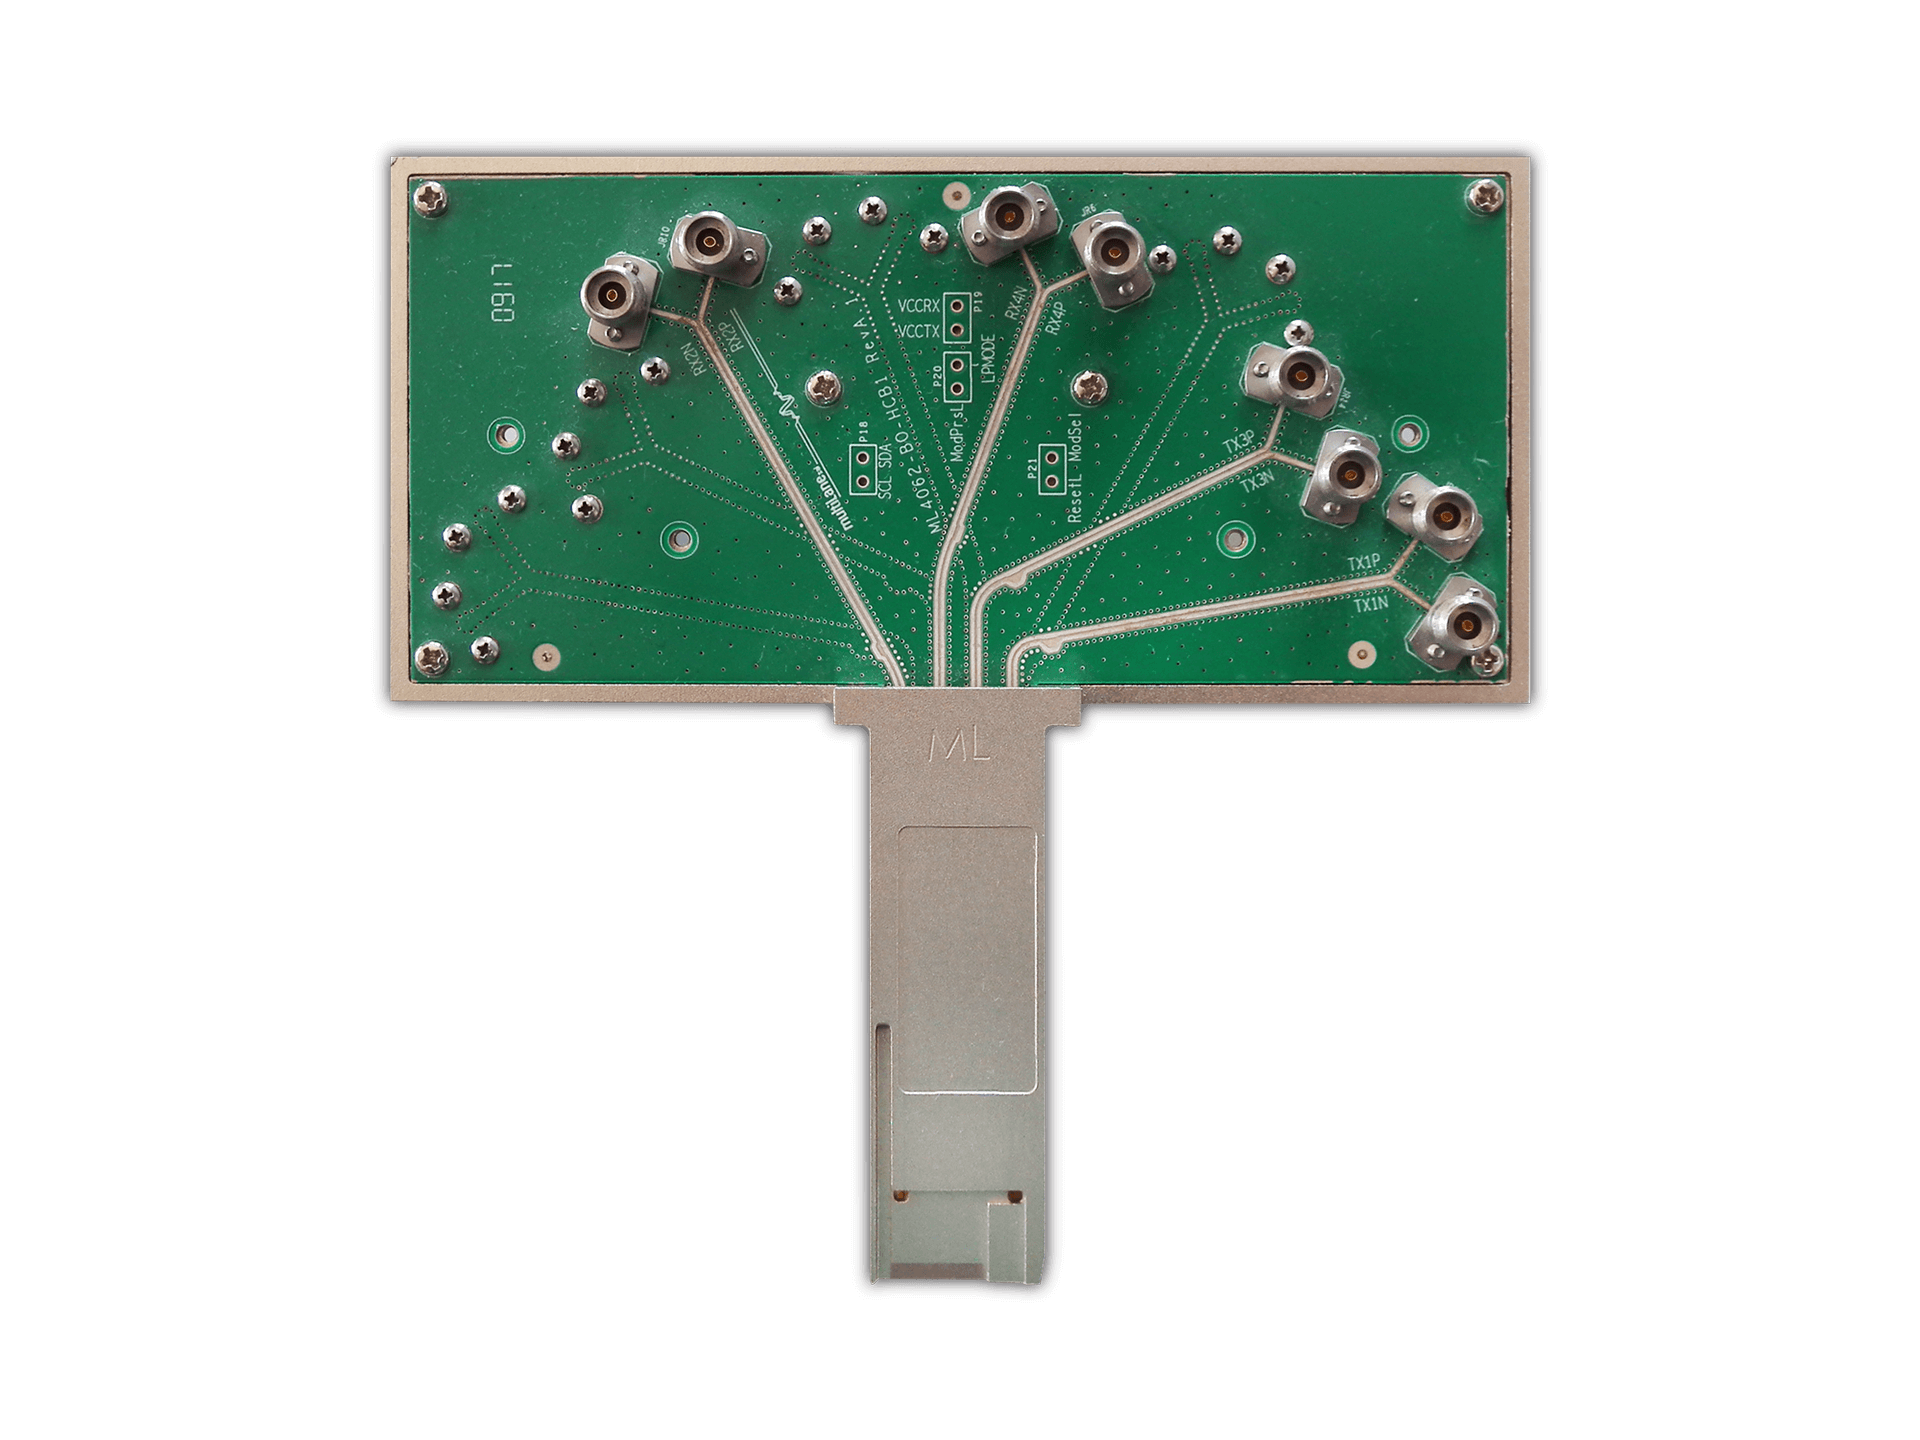 ML4062-HCB1 (t)